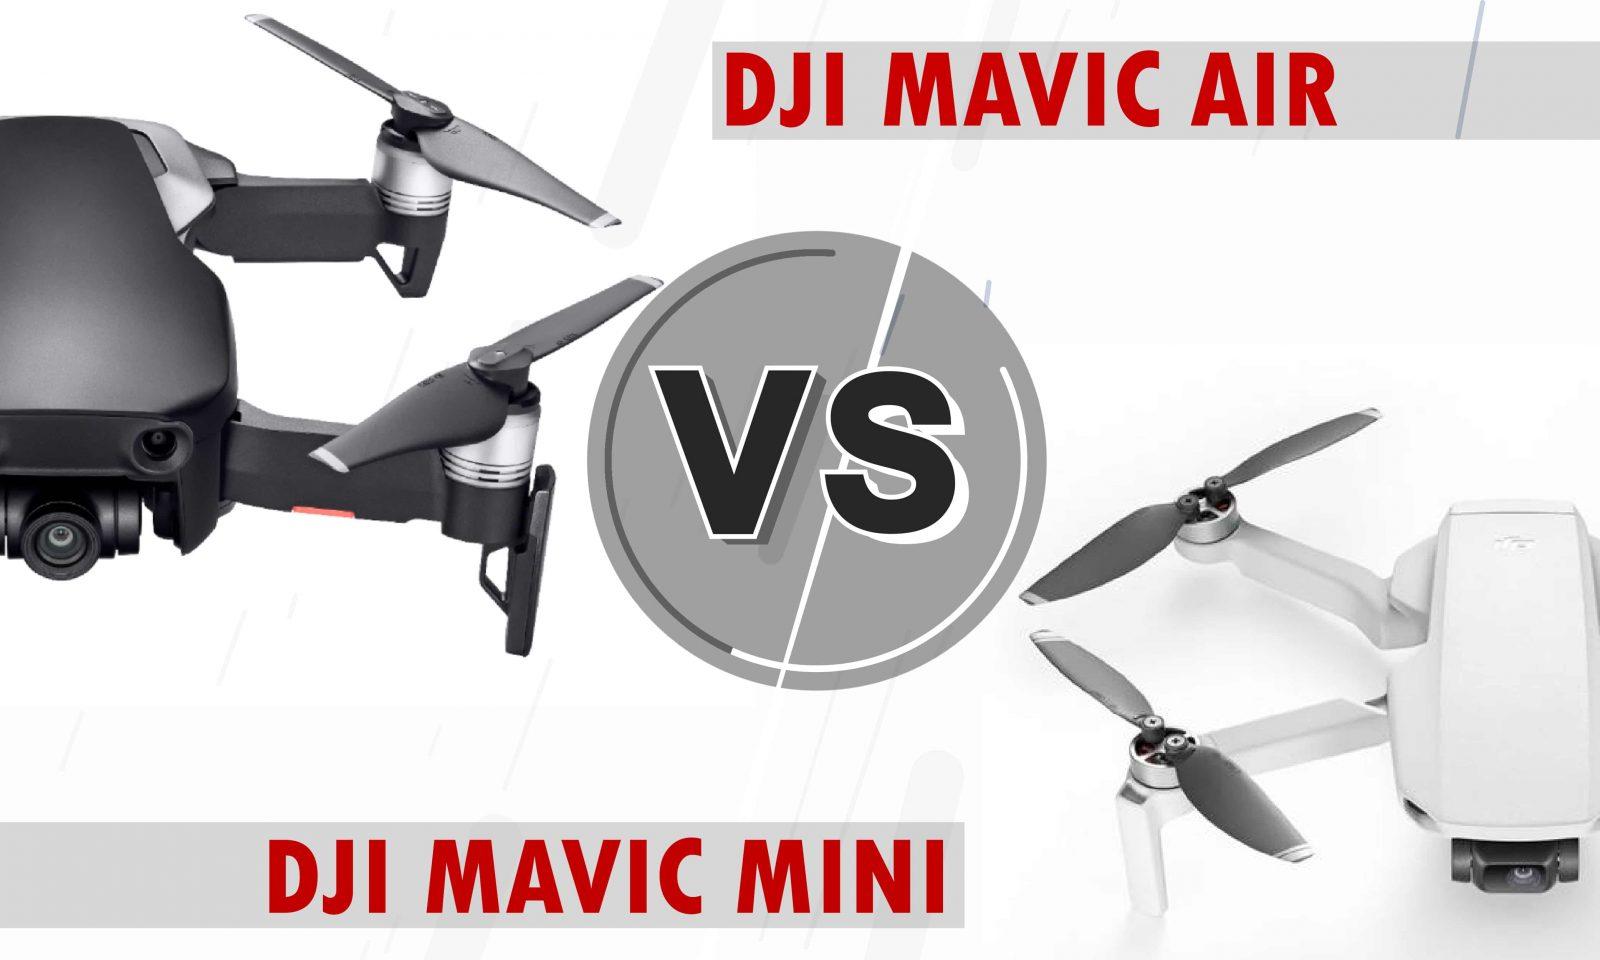 Dji Mavic Mini Vs Air Or Should You Buy The Pro Instead